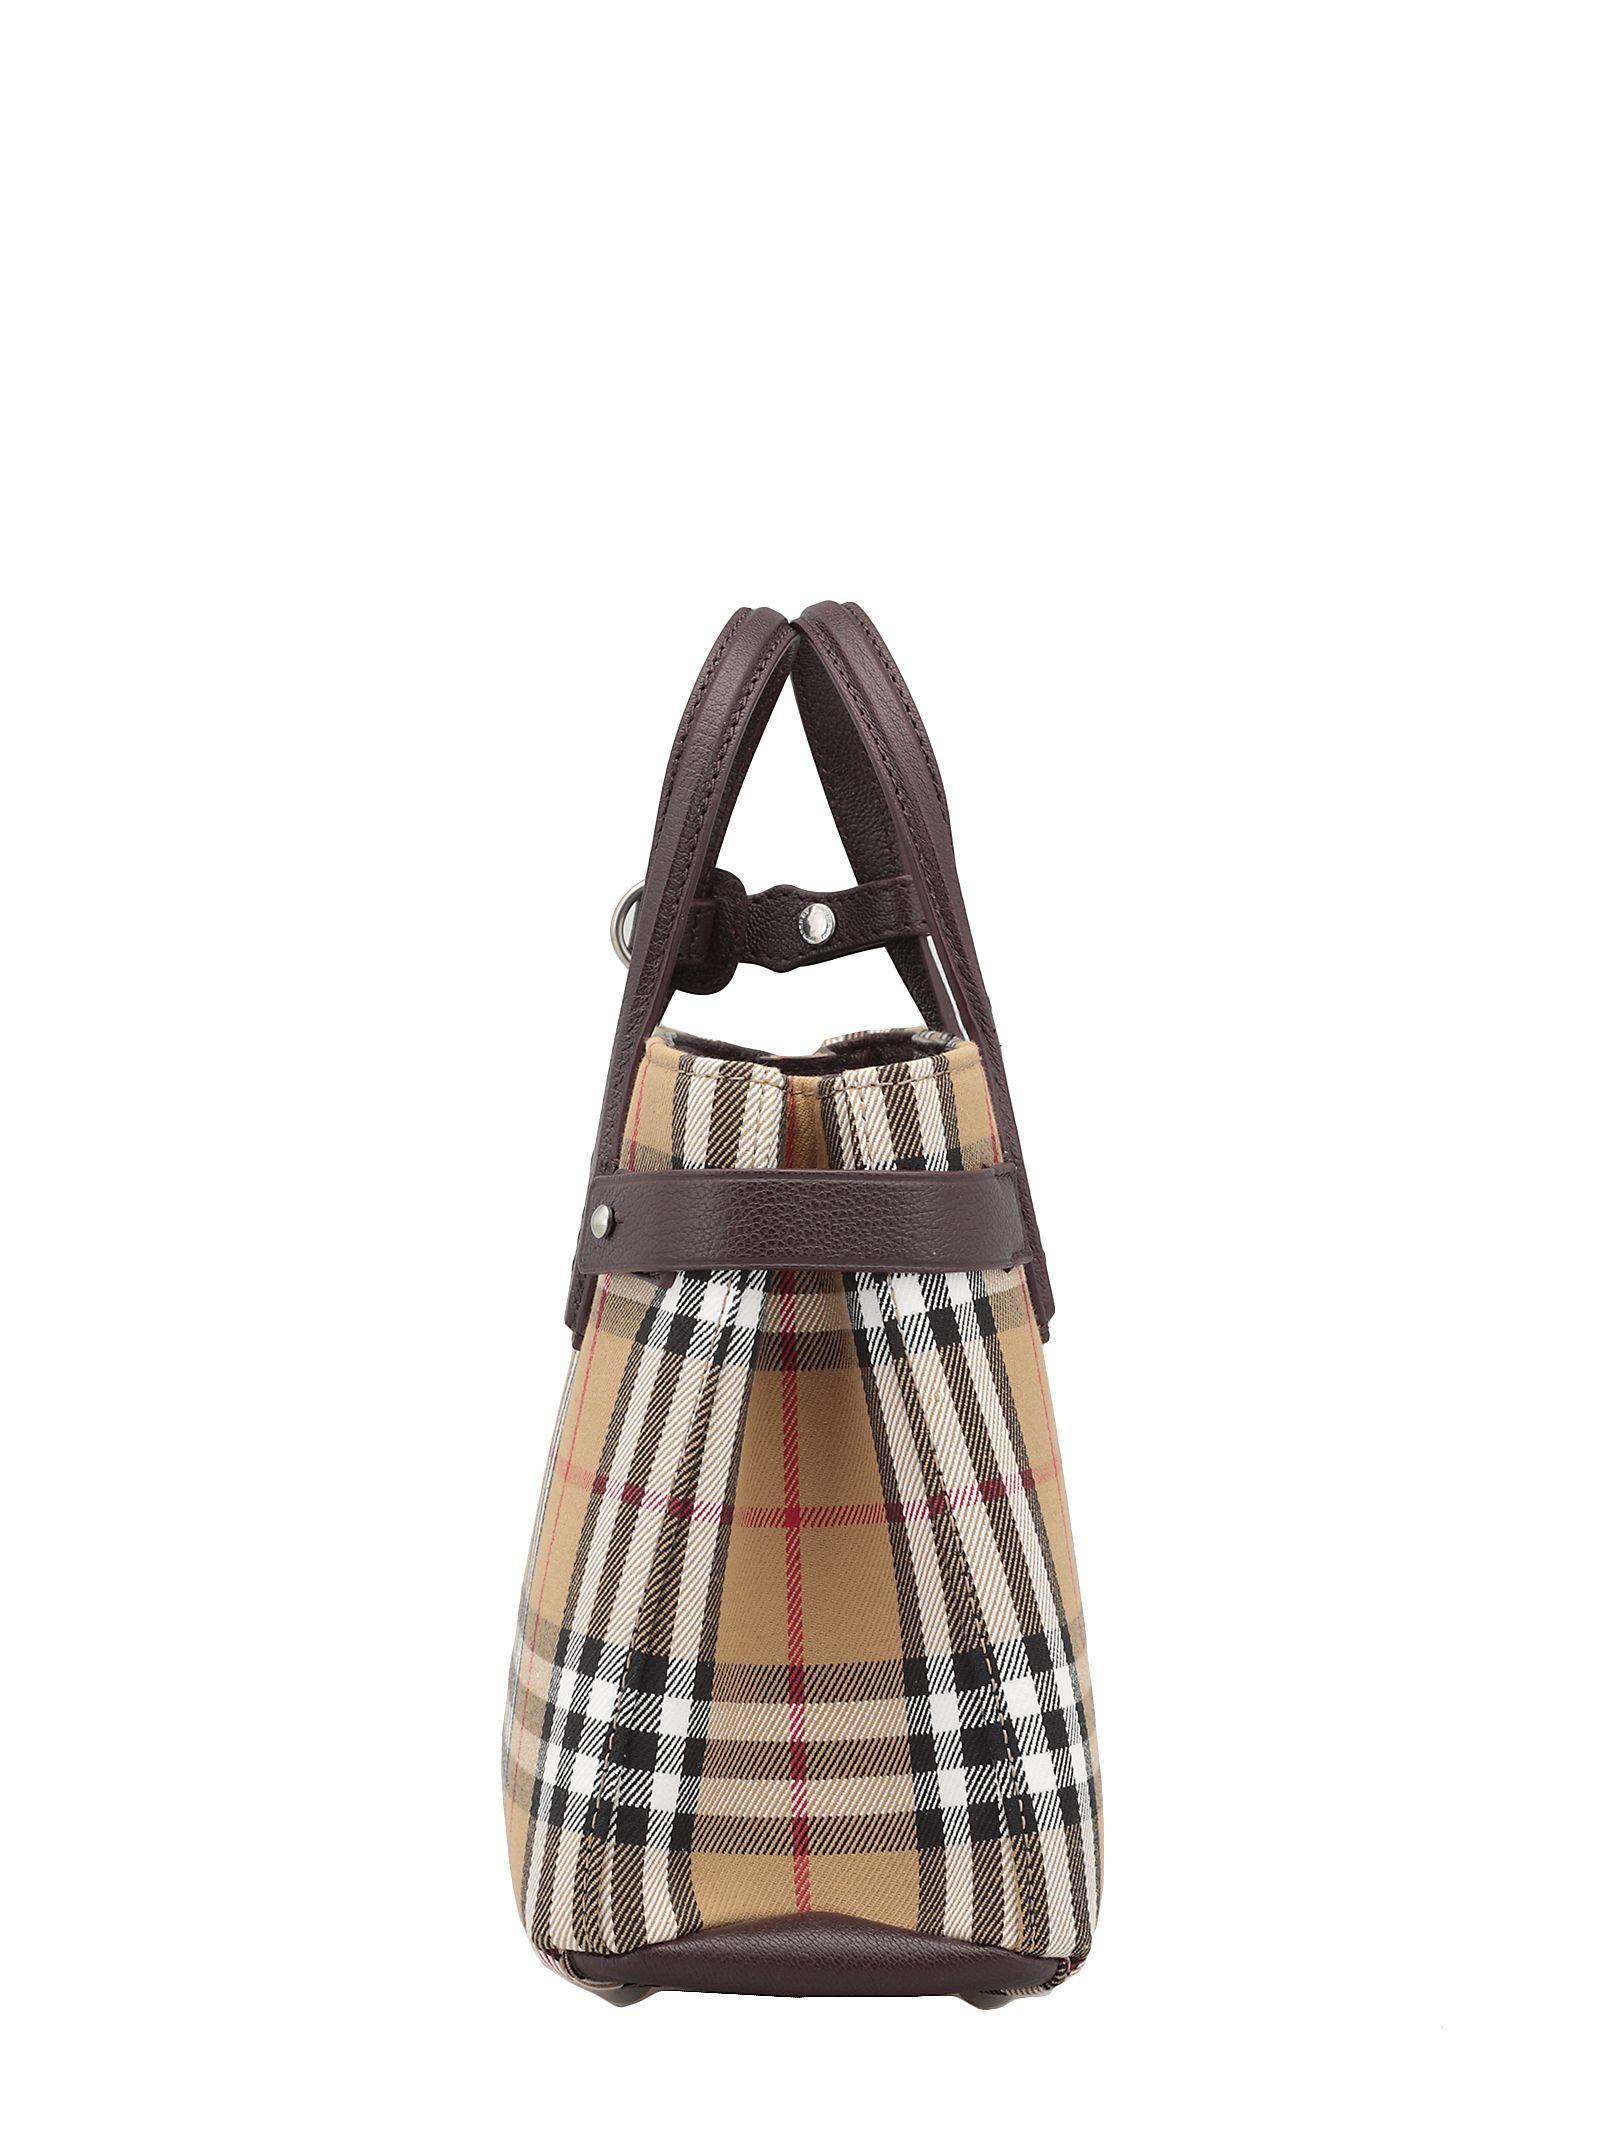 c8d30c827769 Burberry Burberry Small Banner Bag - DEEP CLARET - 10952728